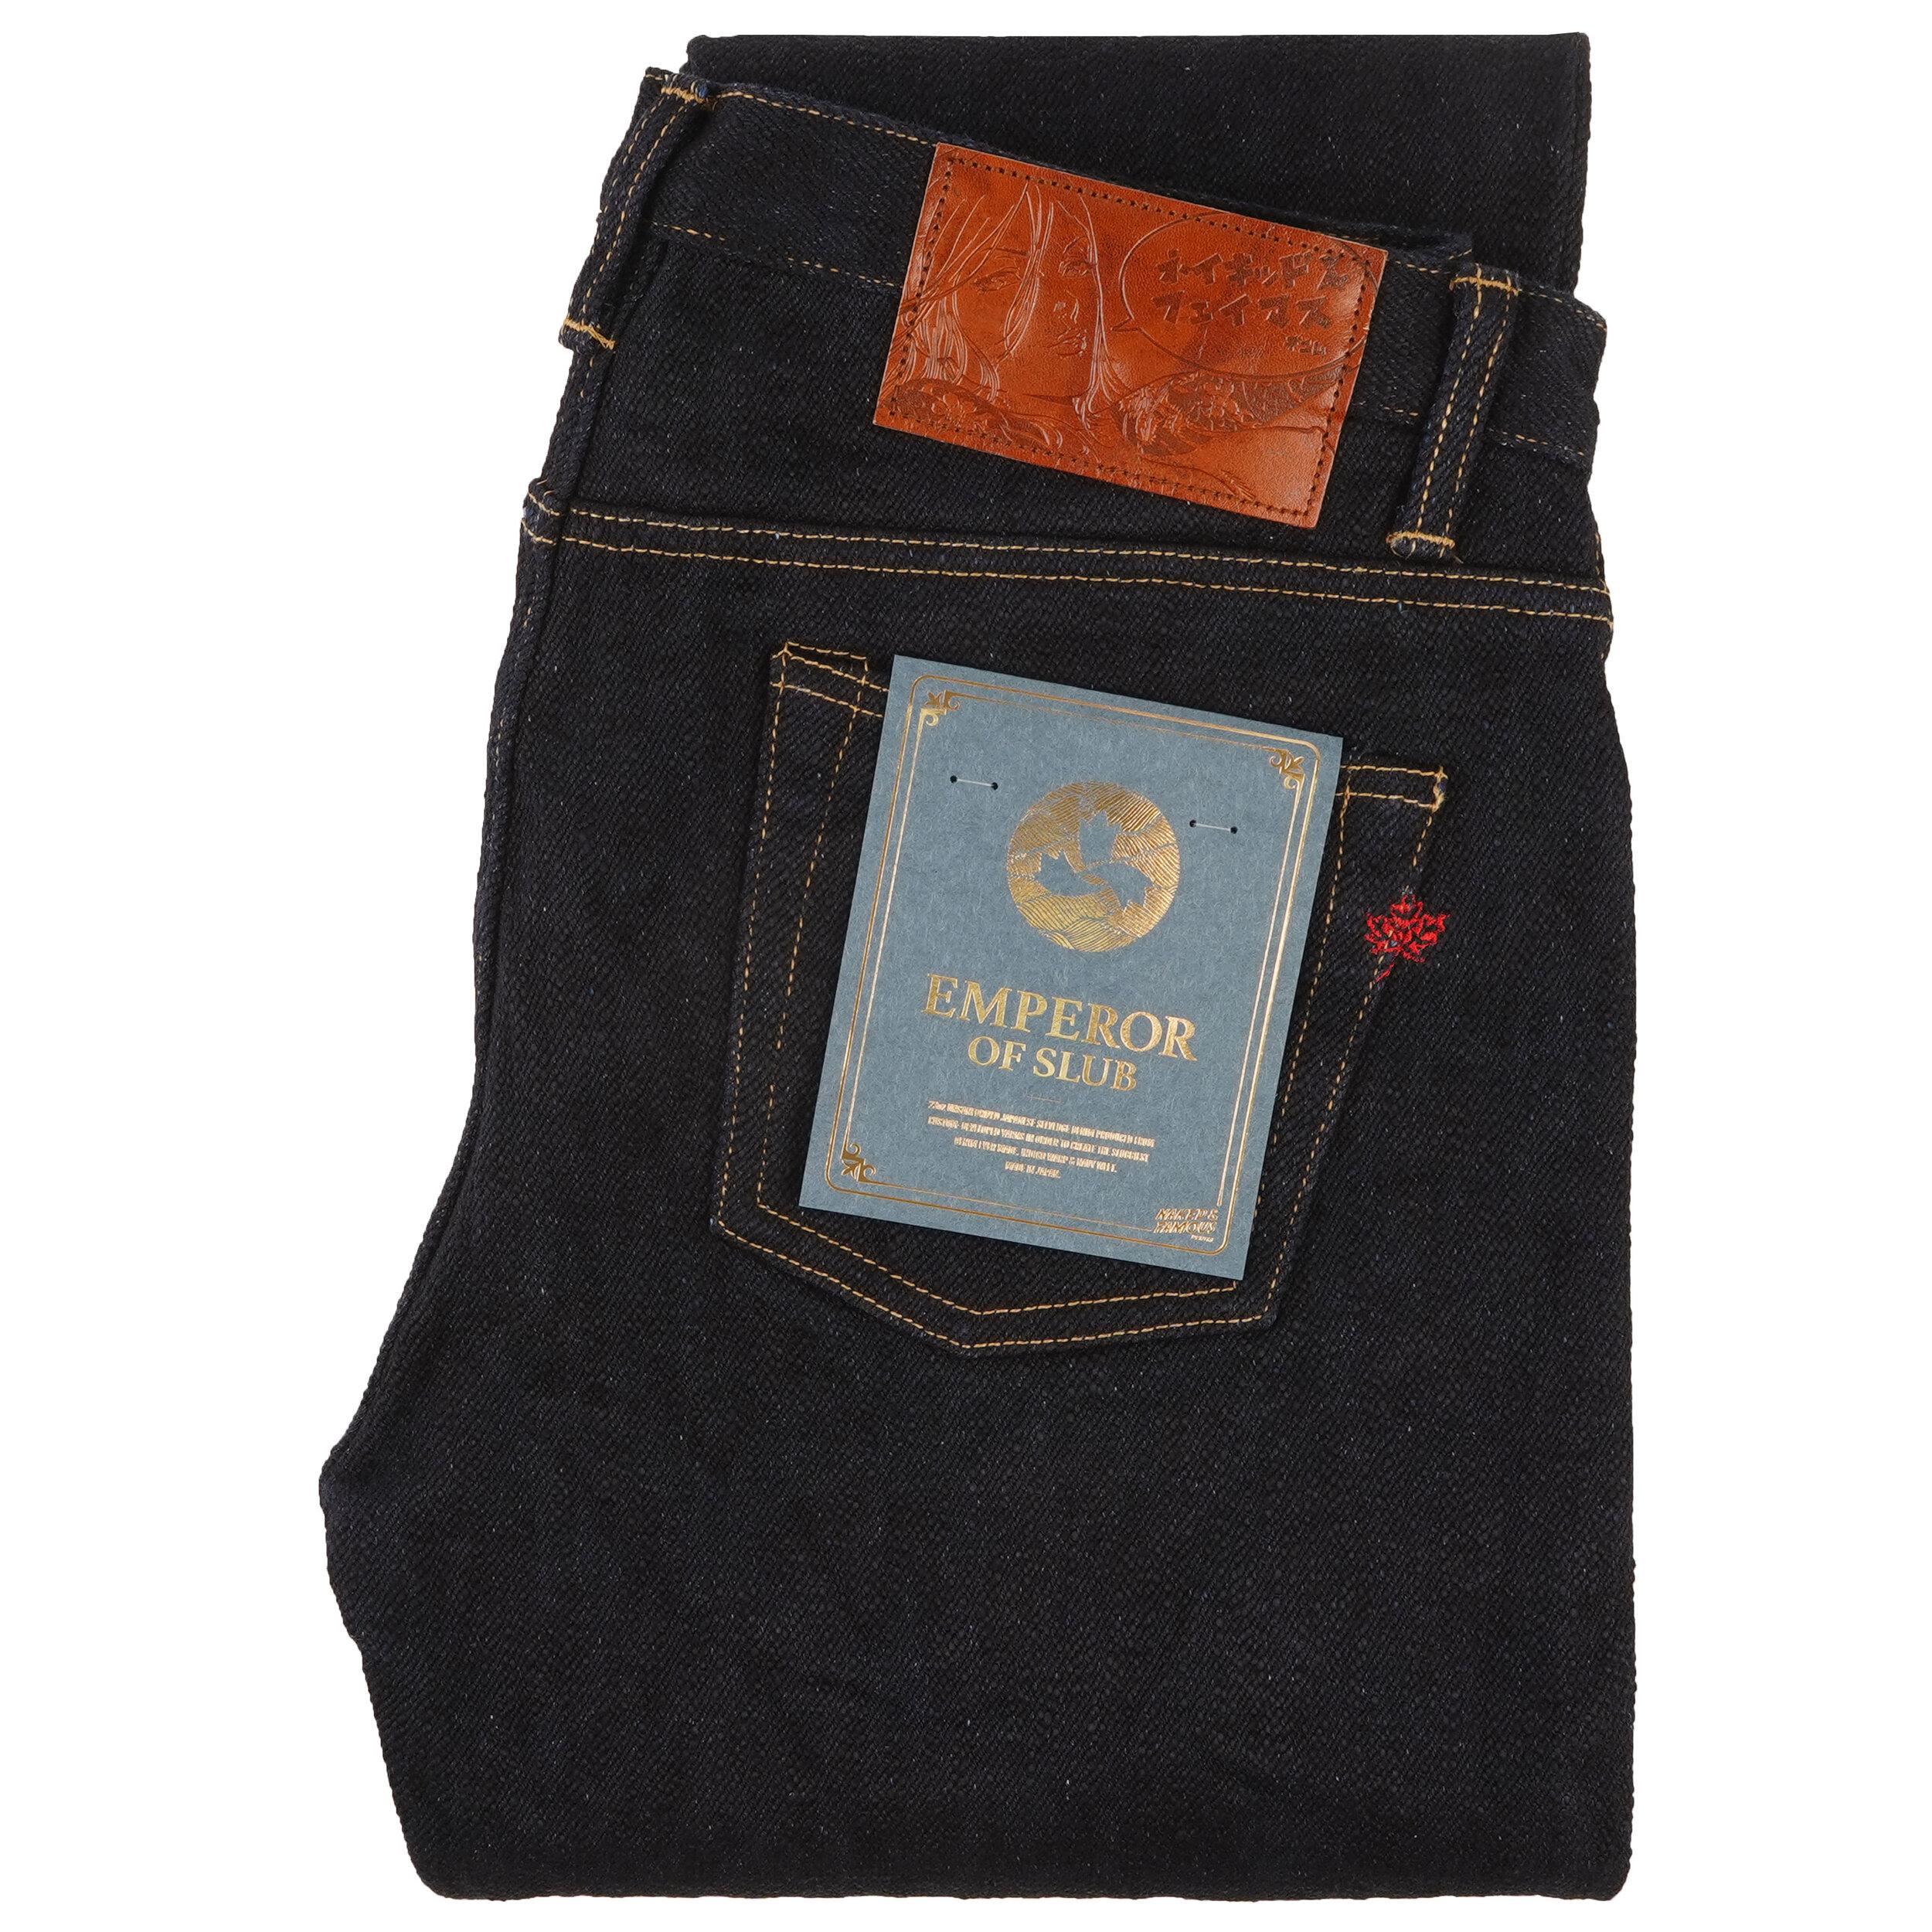 Emperor of Slub Grand Blue Jeans - folded